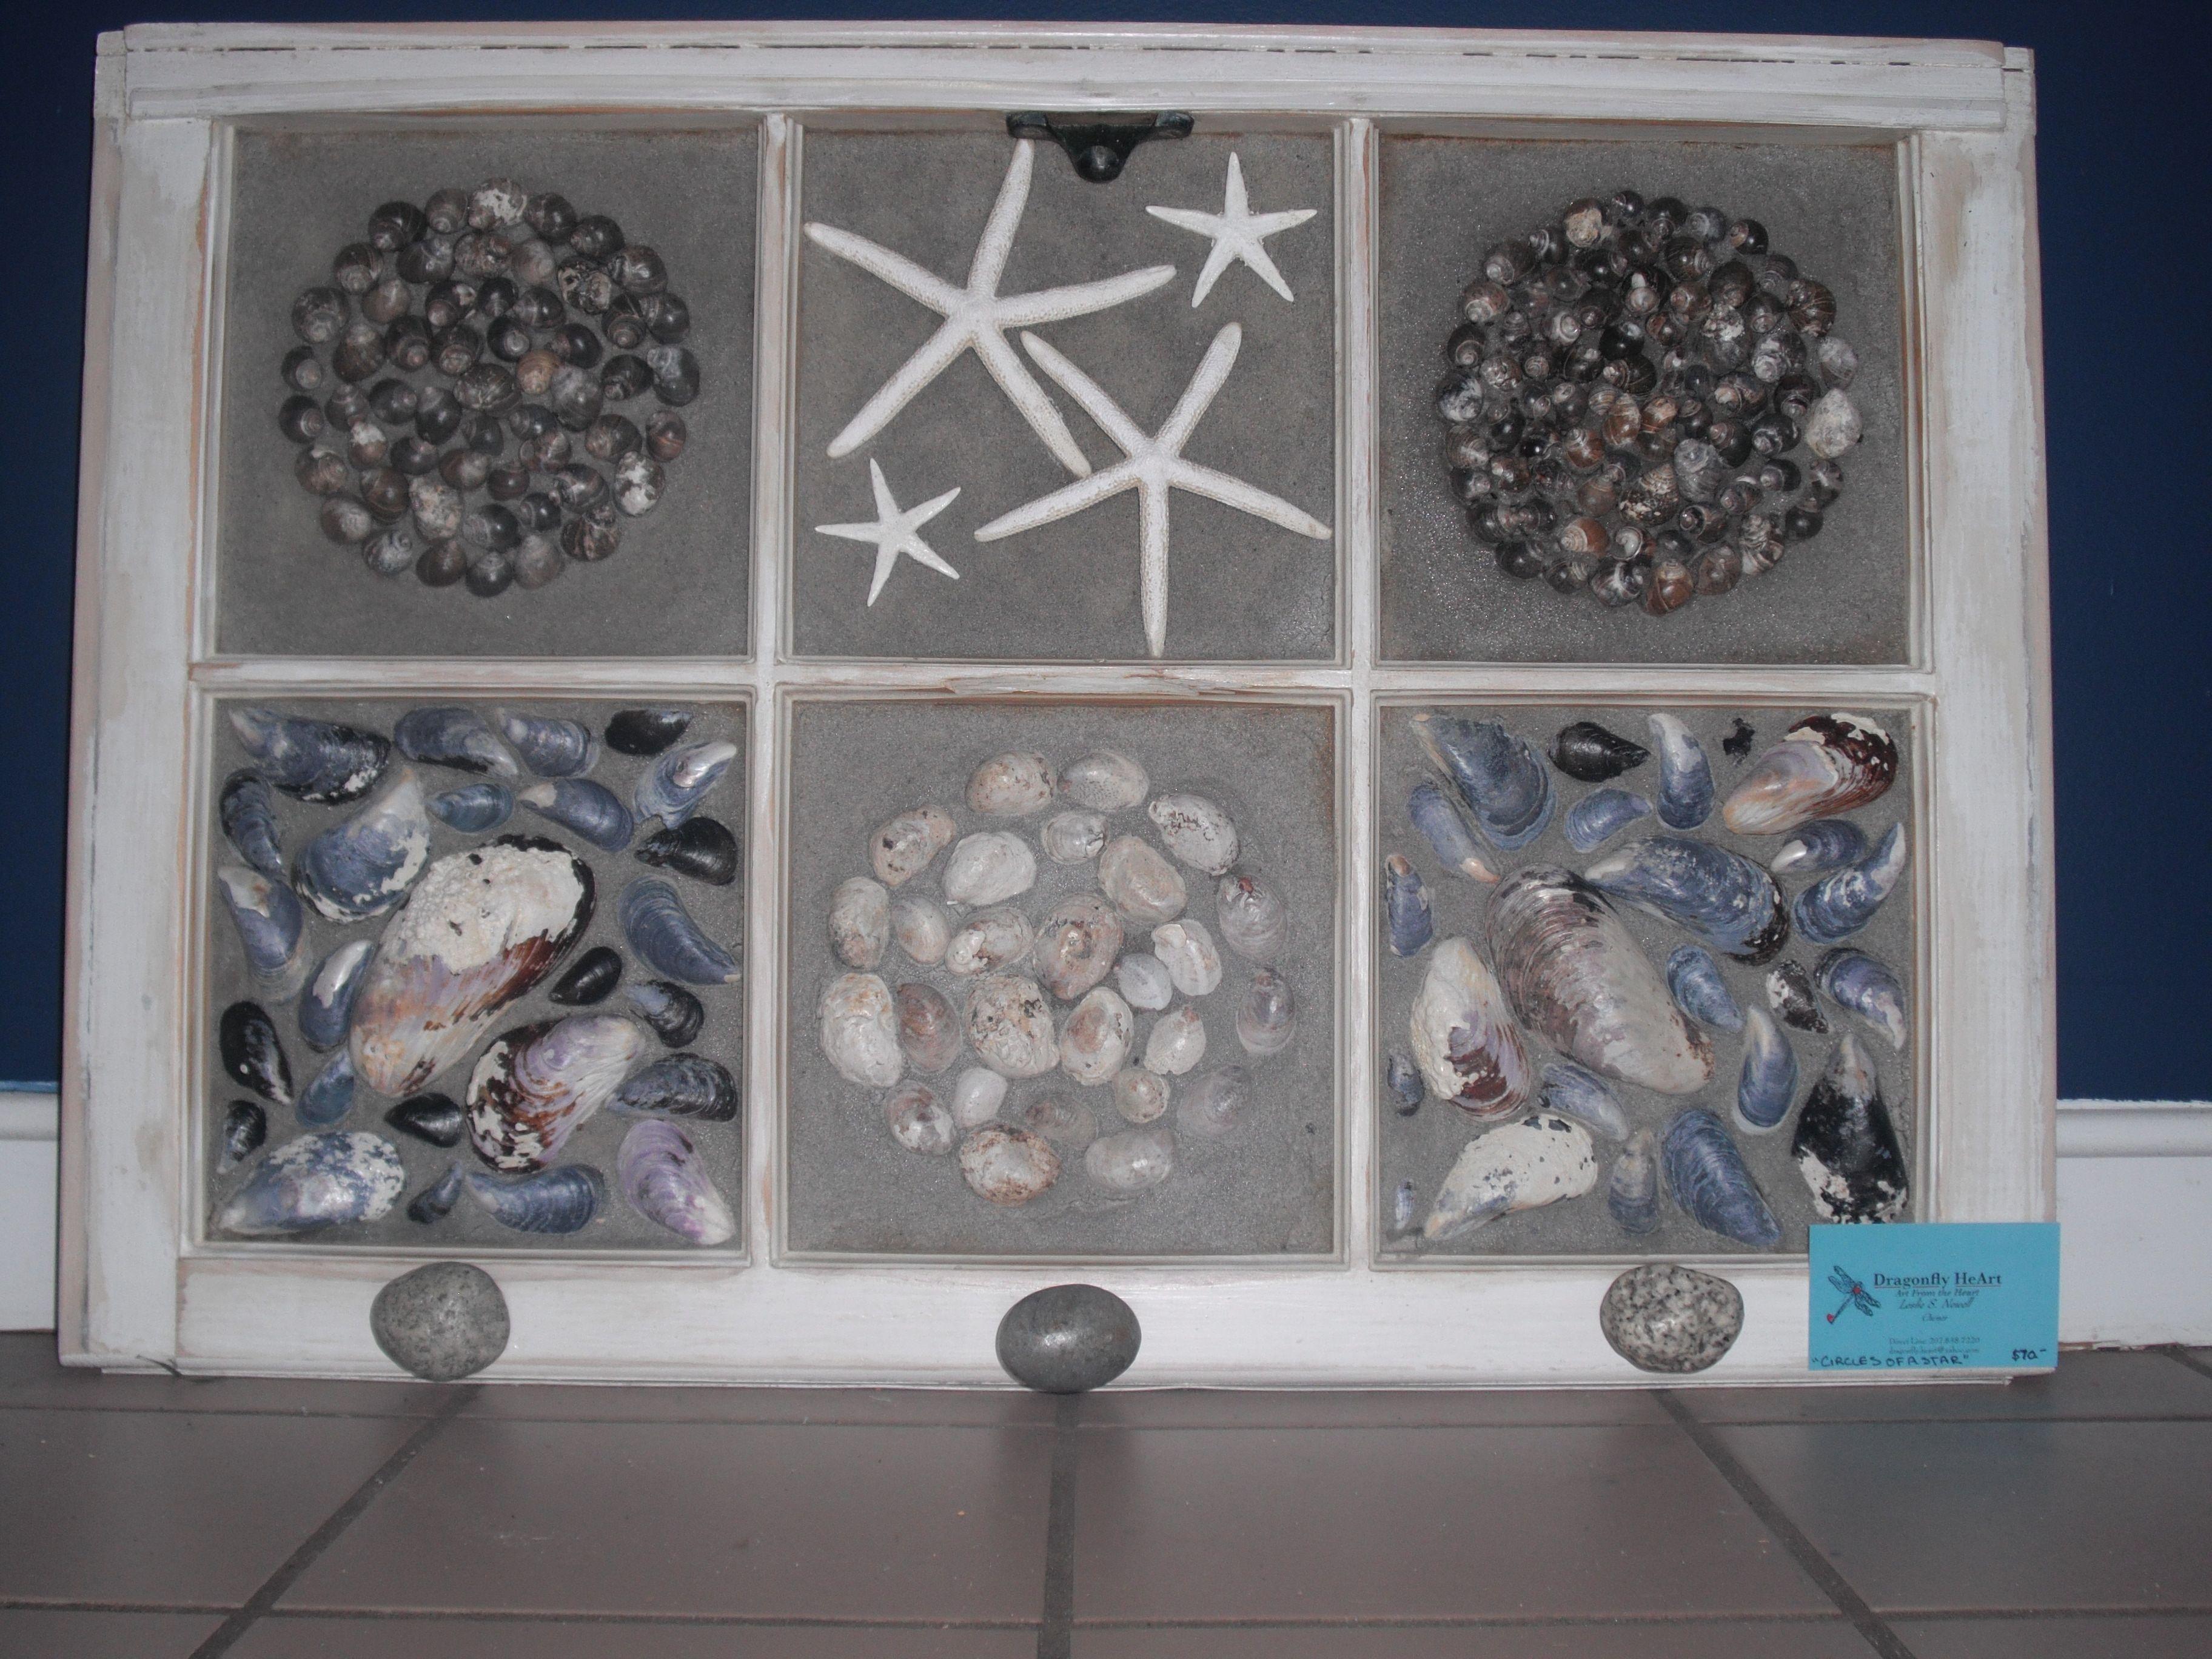 pane window art  DIY arts and craft ideas  Pinterest  Crafts